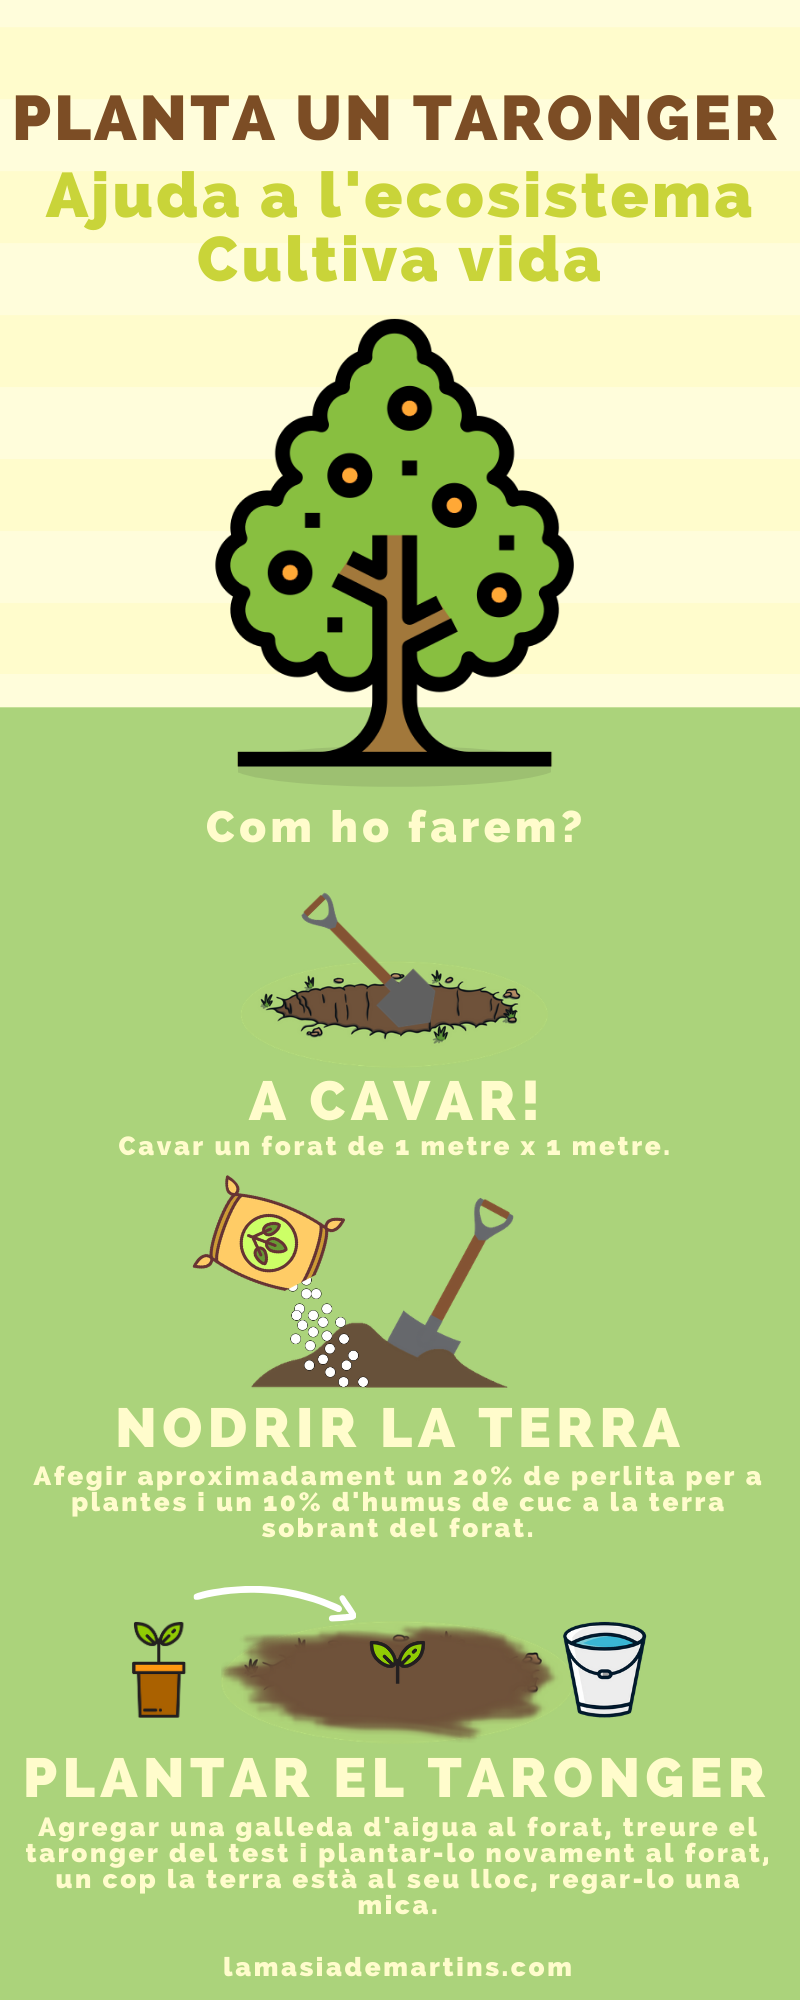 Plantar taronger